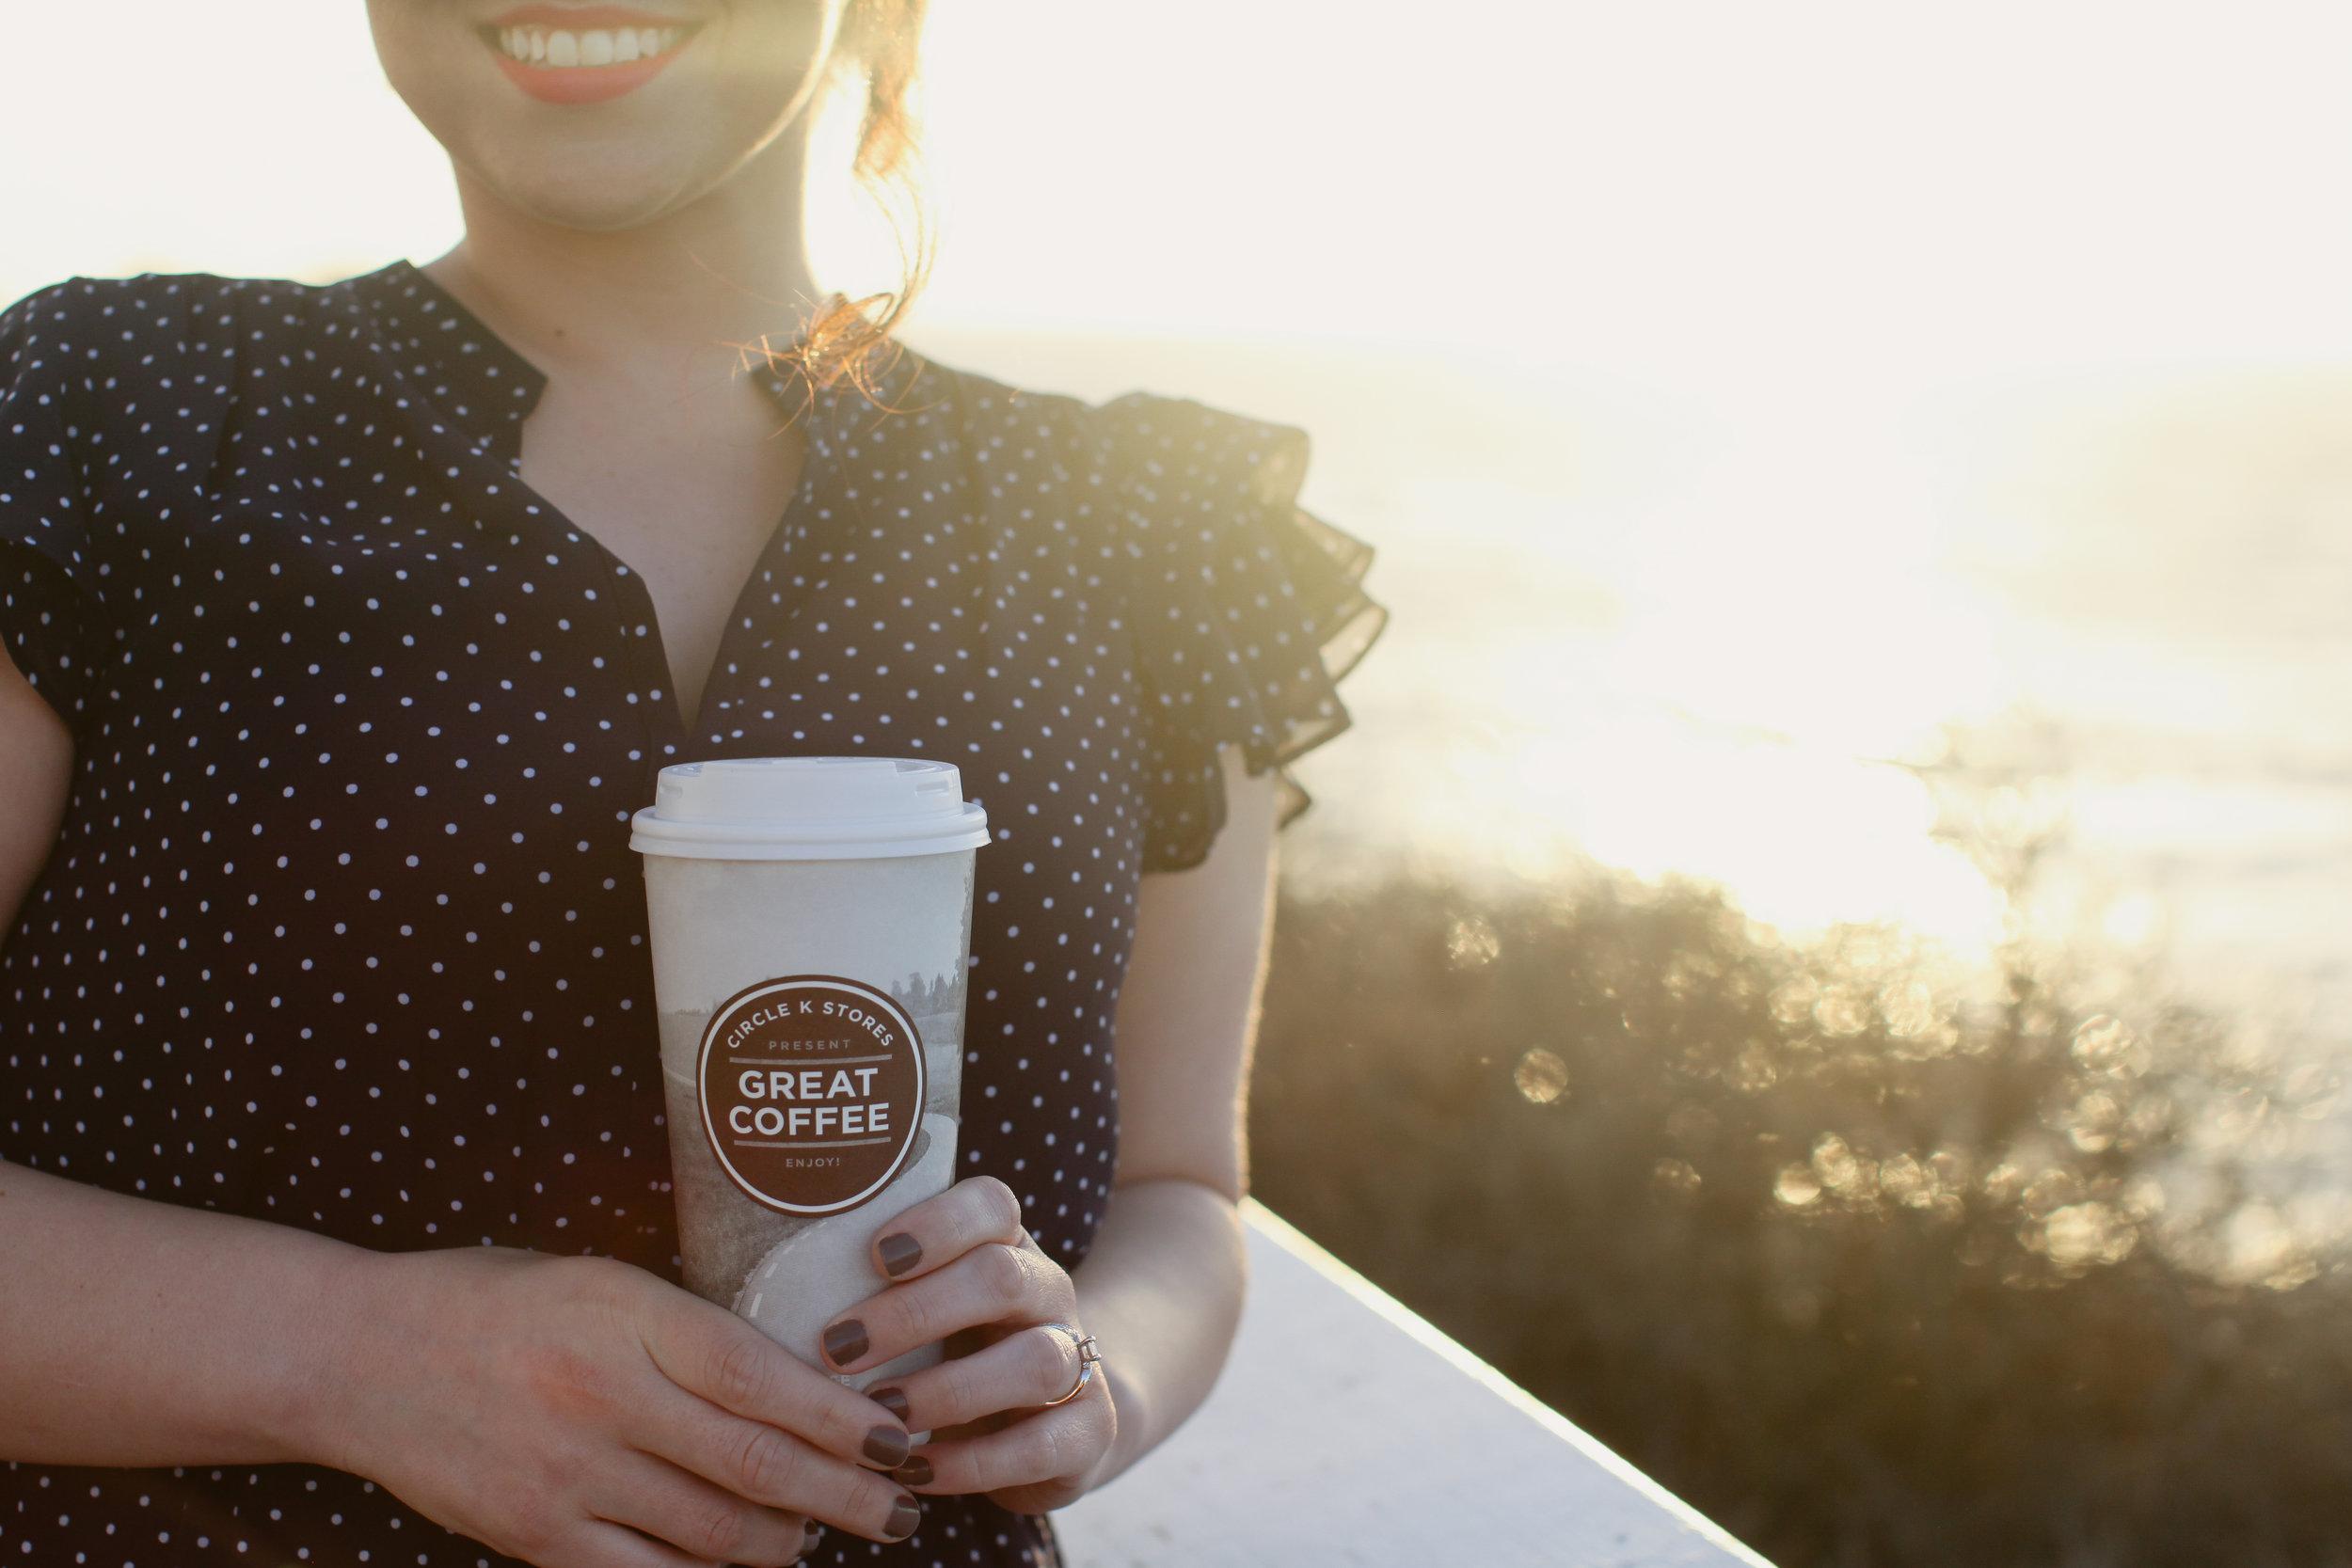 power-of-pr-circle-k-simply-great-coffee